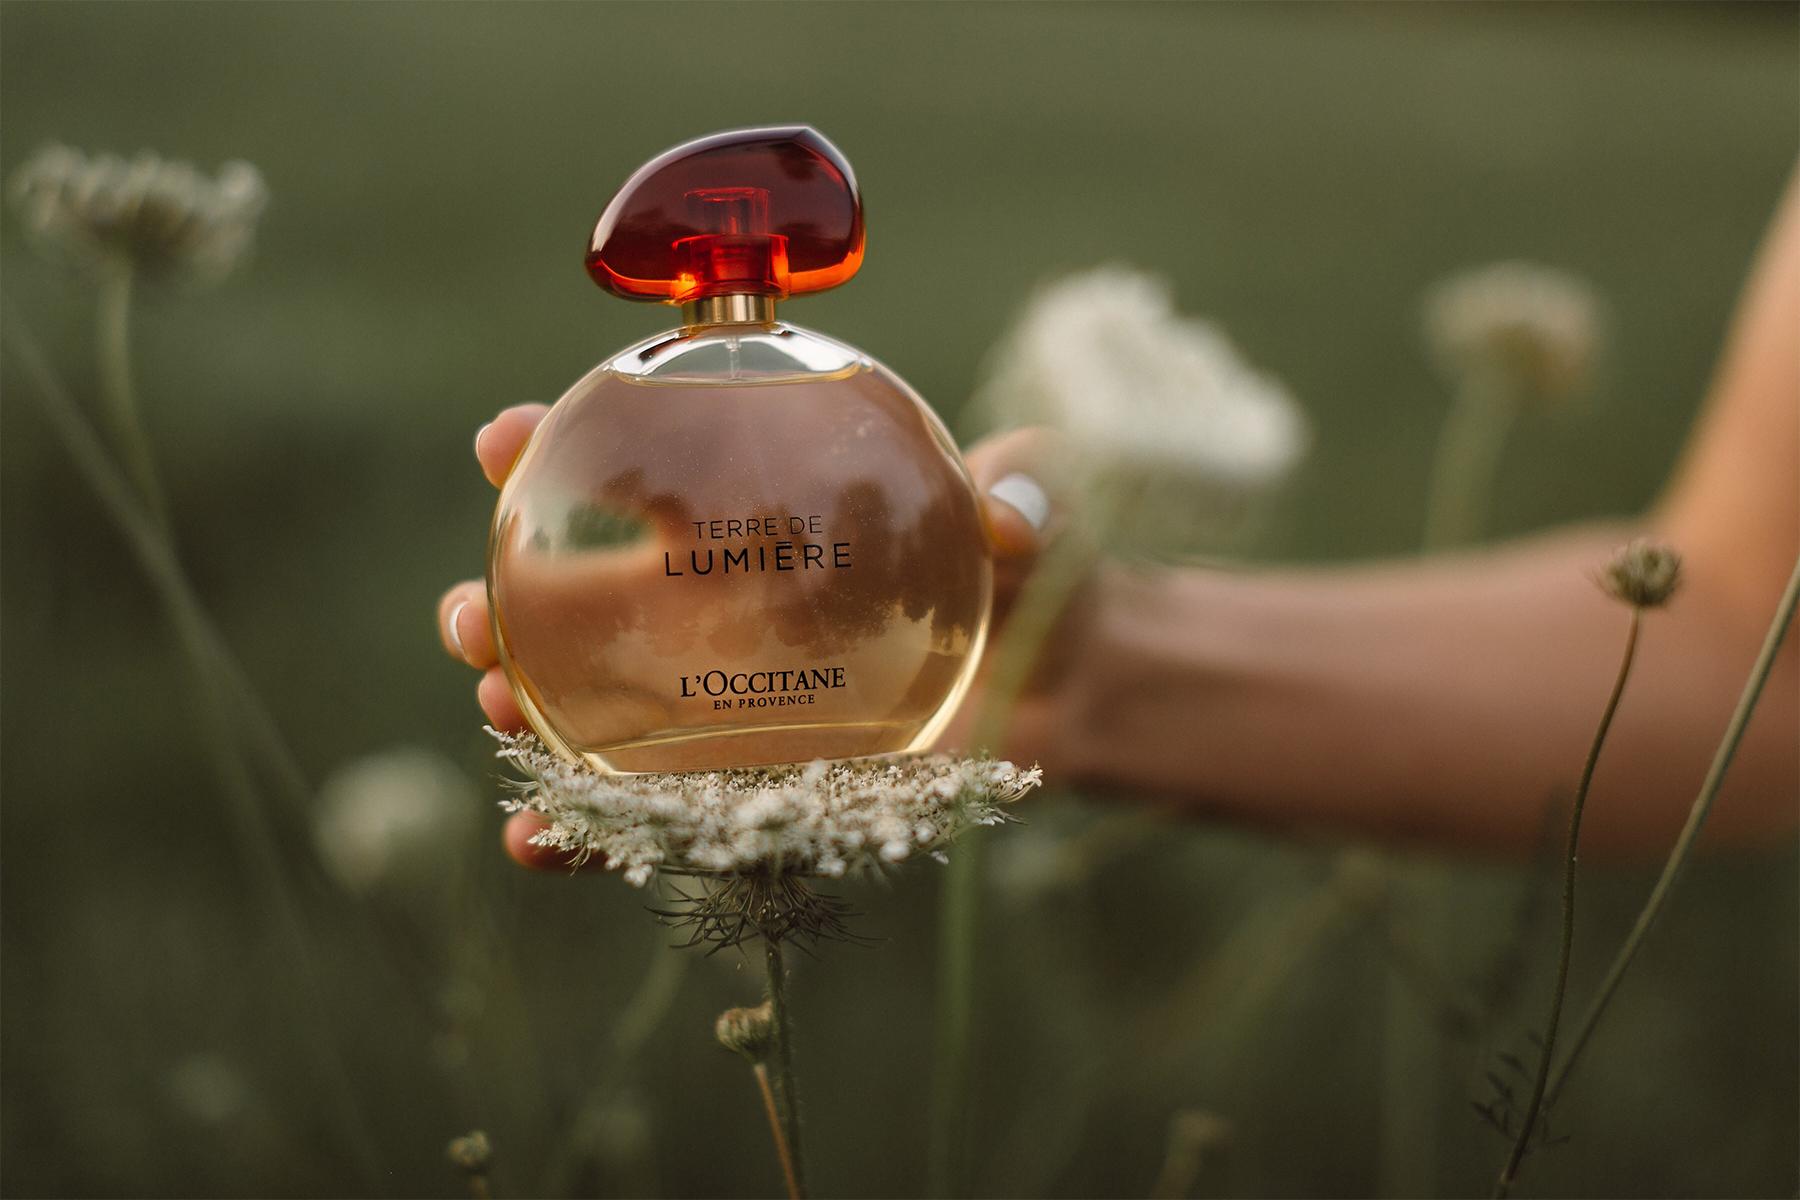 L'Occitane Terre de Lumiere Parfume